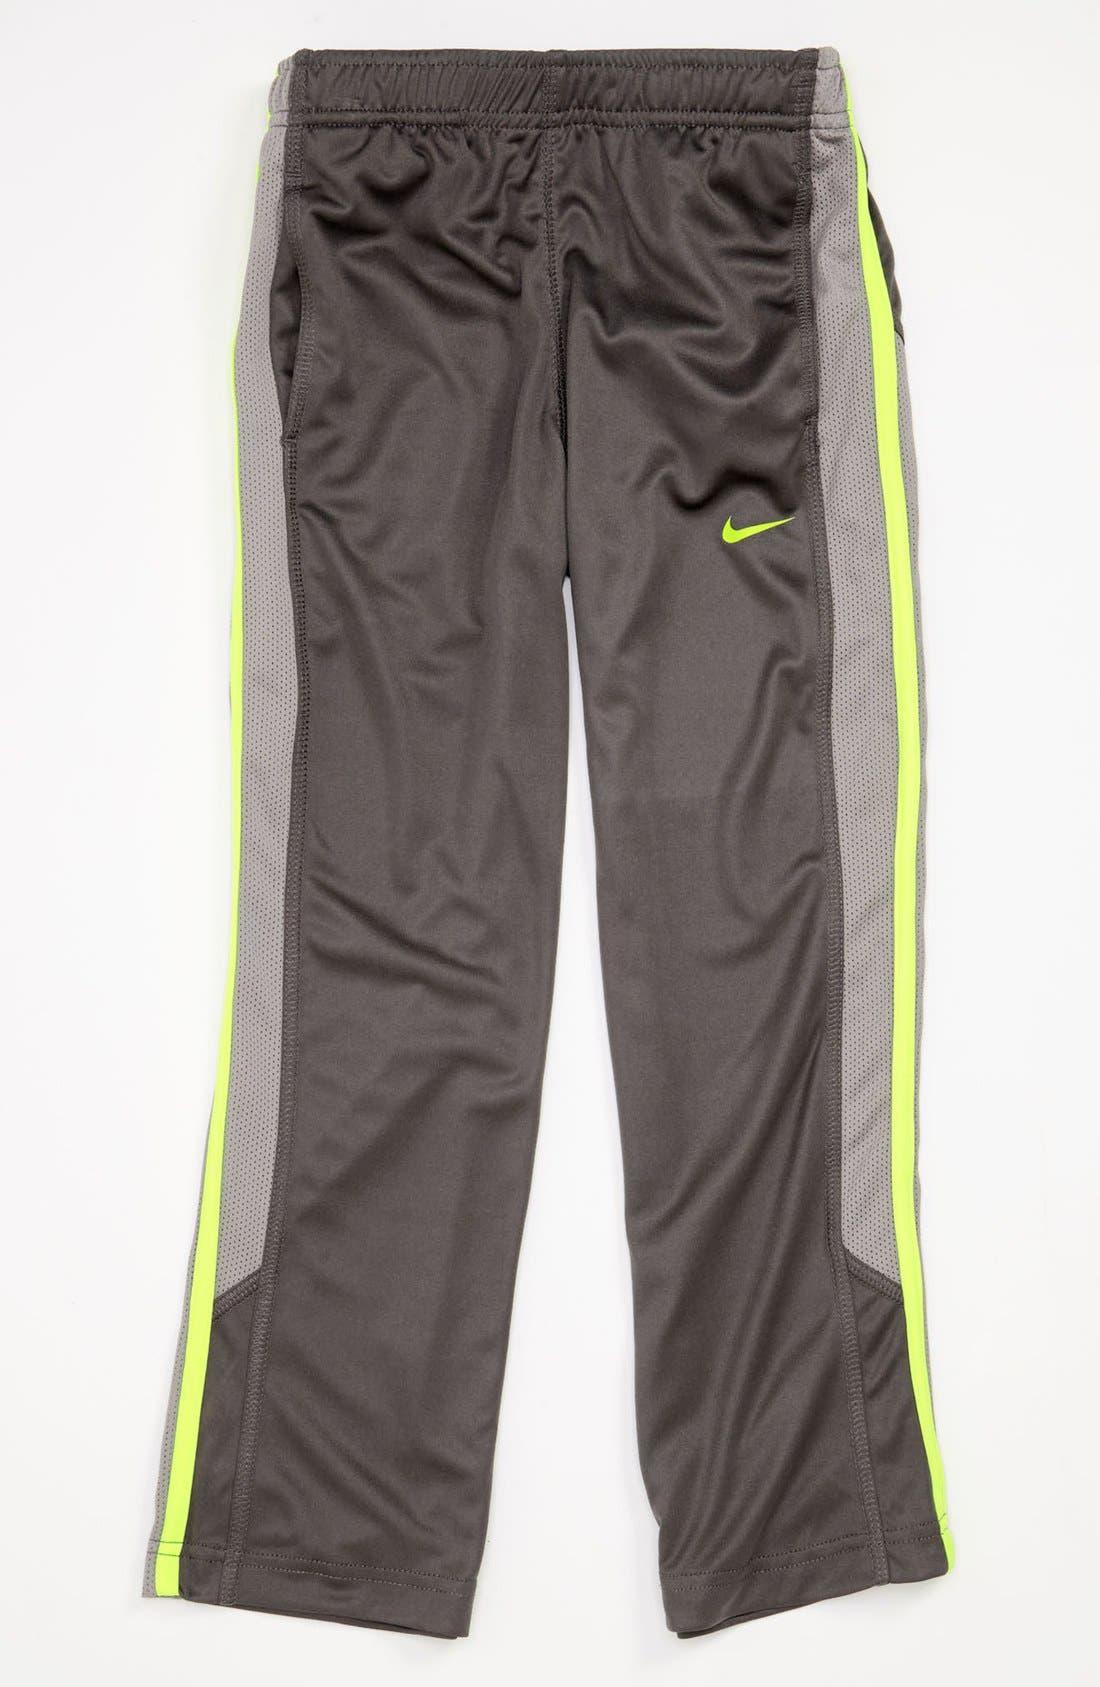 Alternate Image 1 Selected - Nike 'Lights Out' Pants (Little Boys)